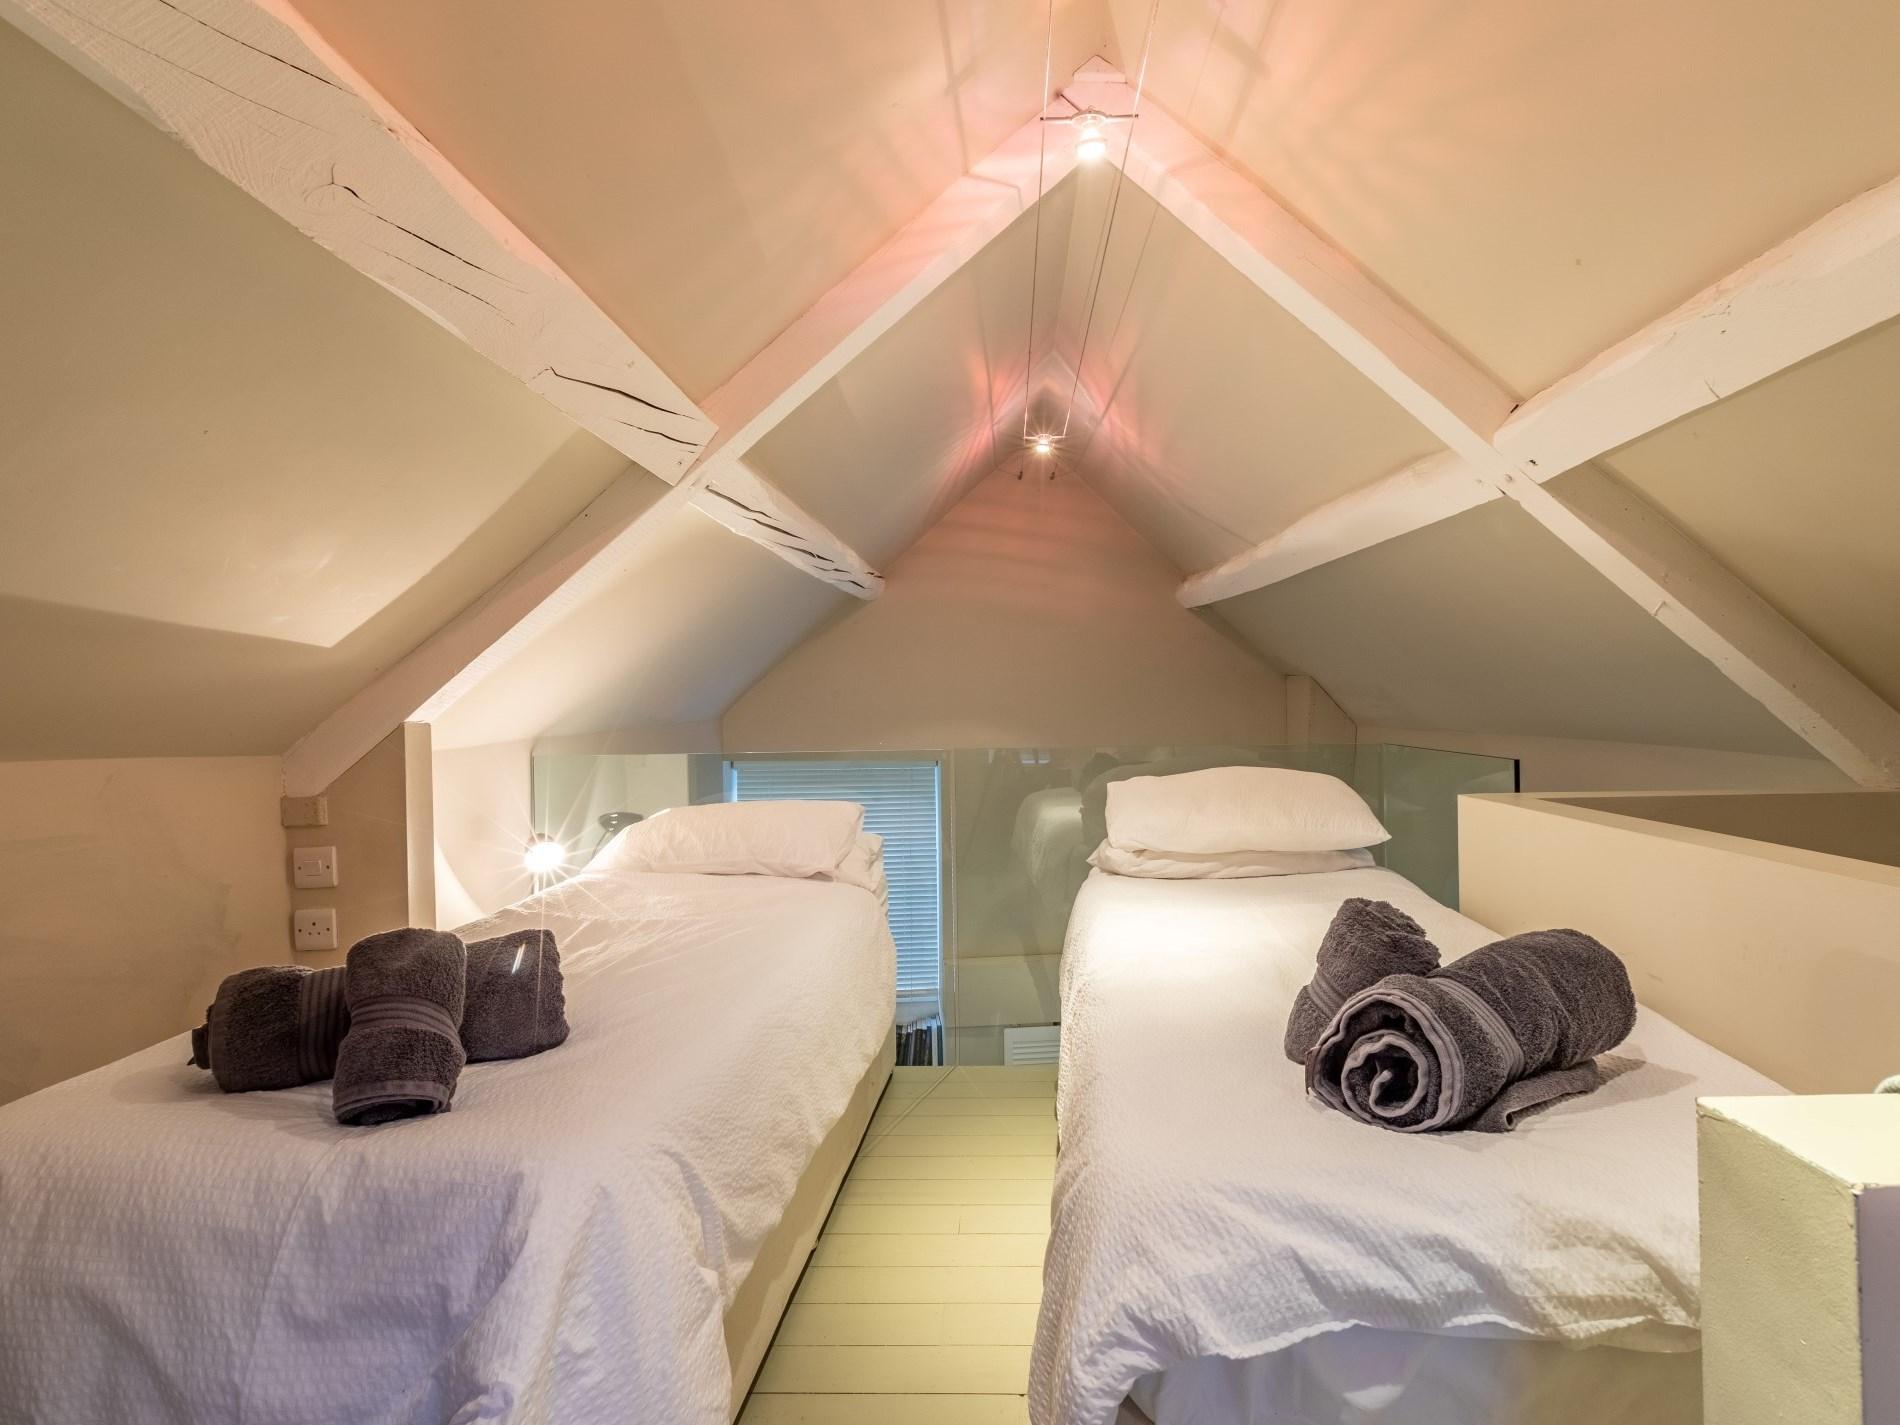 3 Bedroom Cottage in Moreton -in- Marsh, Heart of England